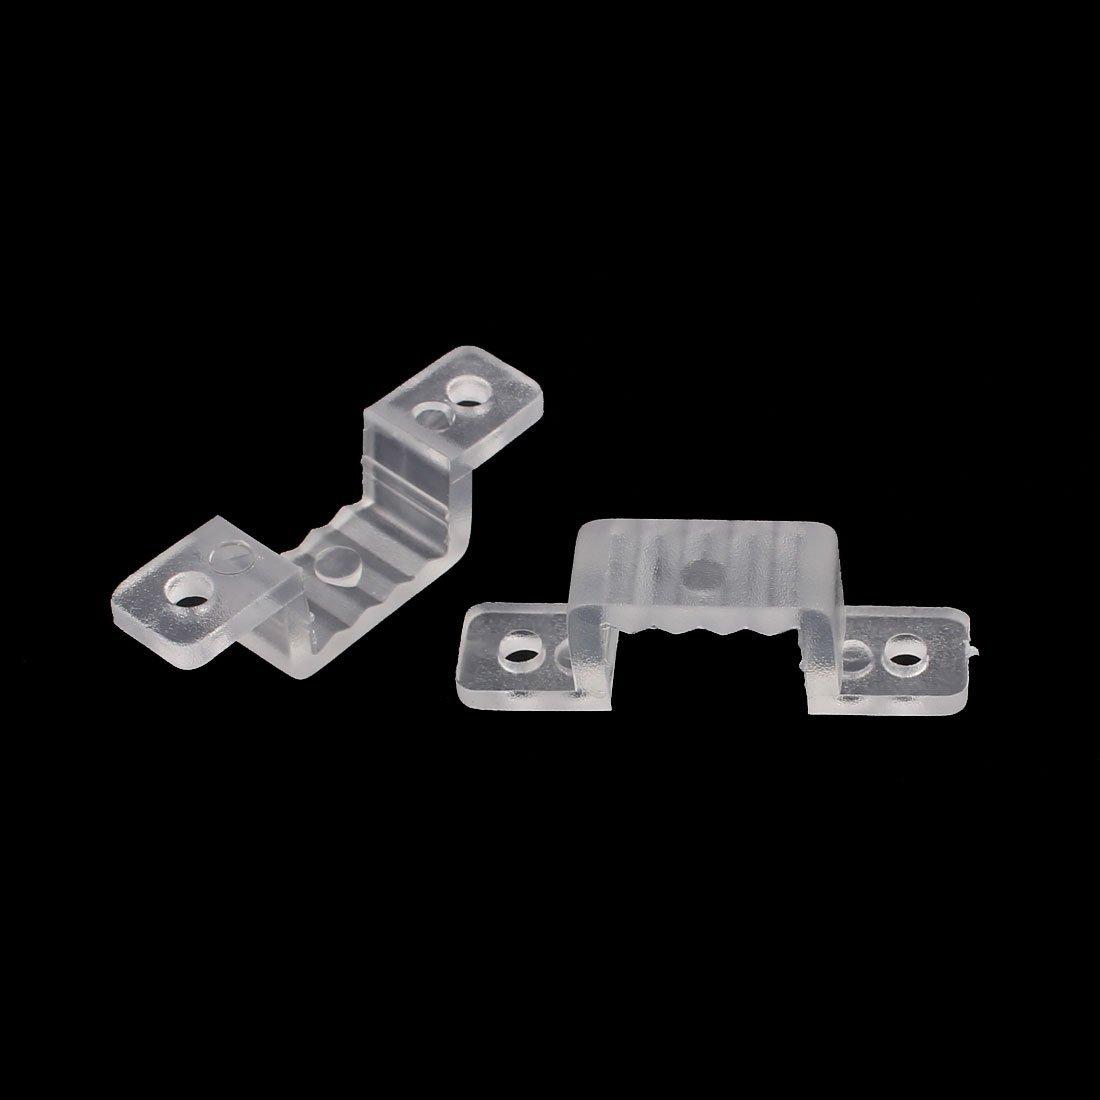 DealMux 15mm x 7mm Soporte de montaje de fijaci/ón de tira de luz LED de pl/ástico transparente 50 piezas